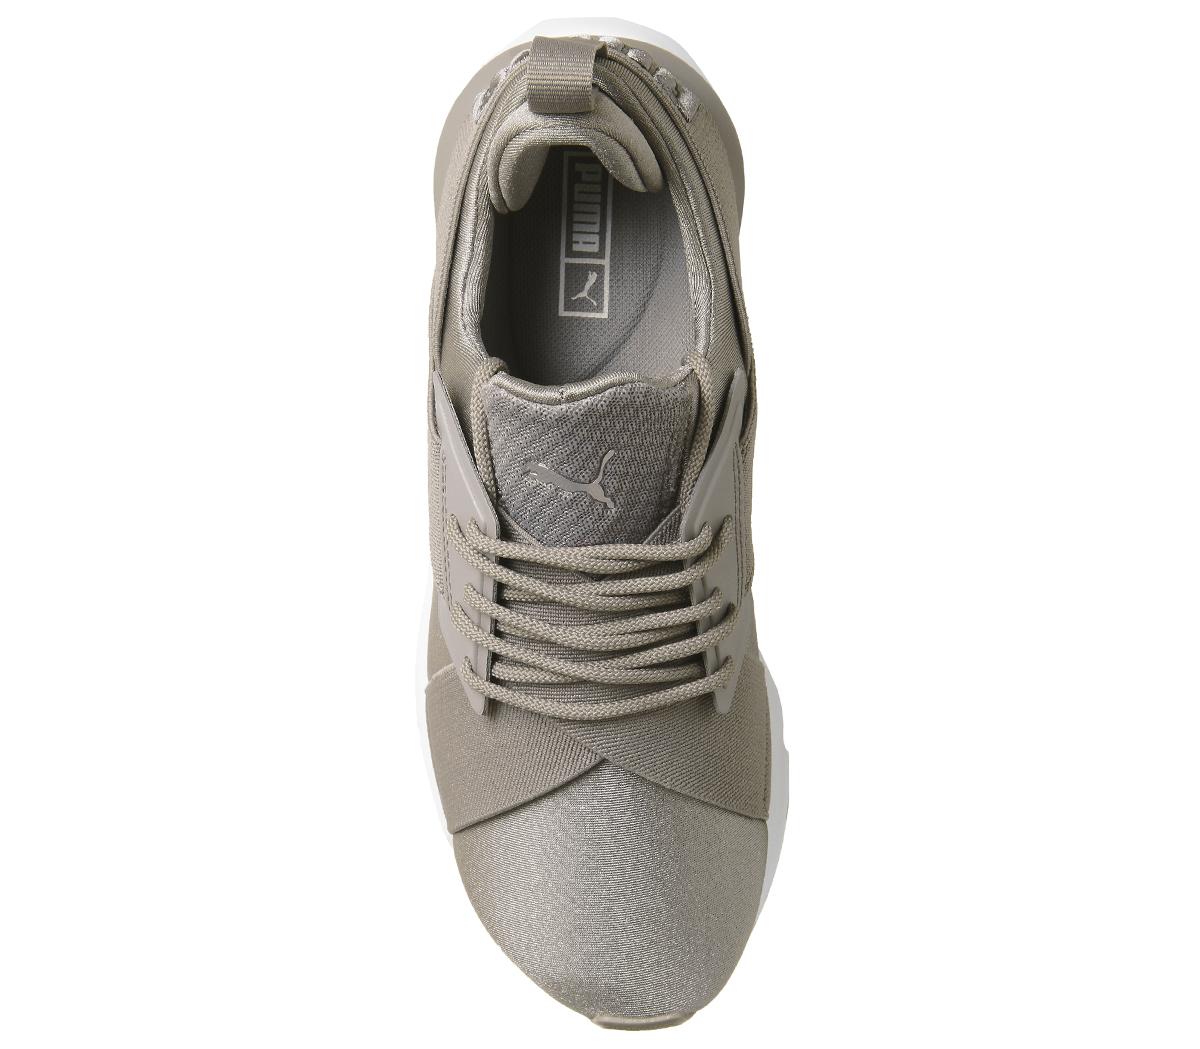 0a8787d9222292 Sentinel Womens Puma Puma Muse X Strap Trainers Rock Ridge Puma White Trainers  Shoes